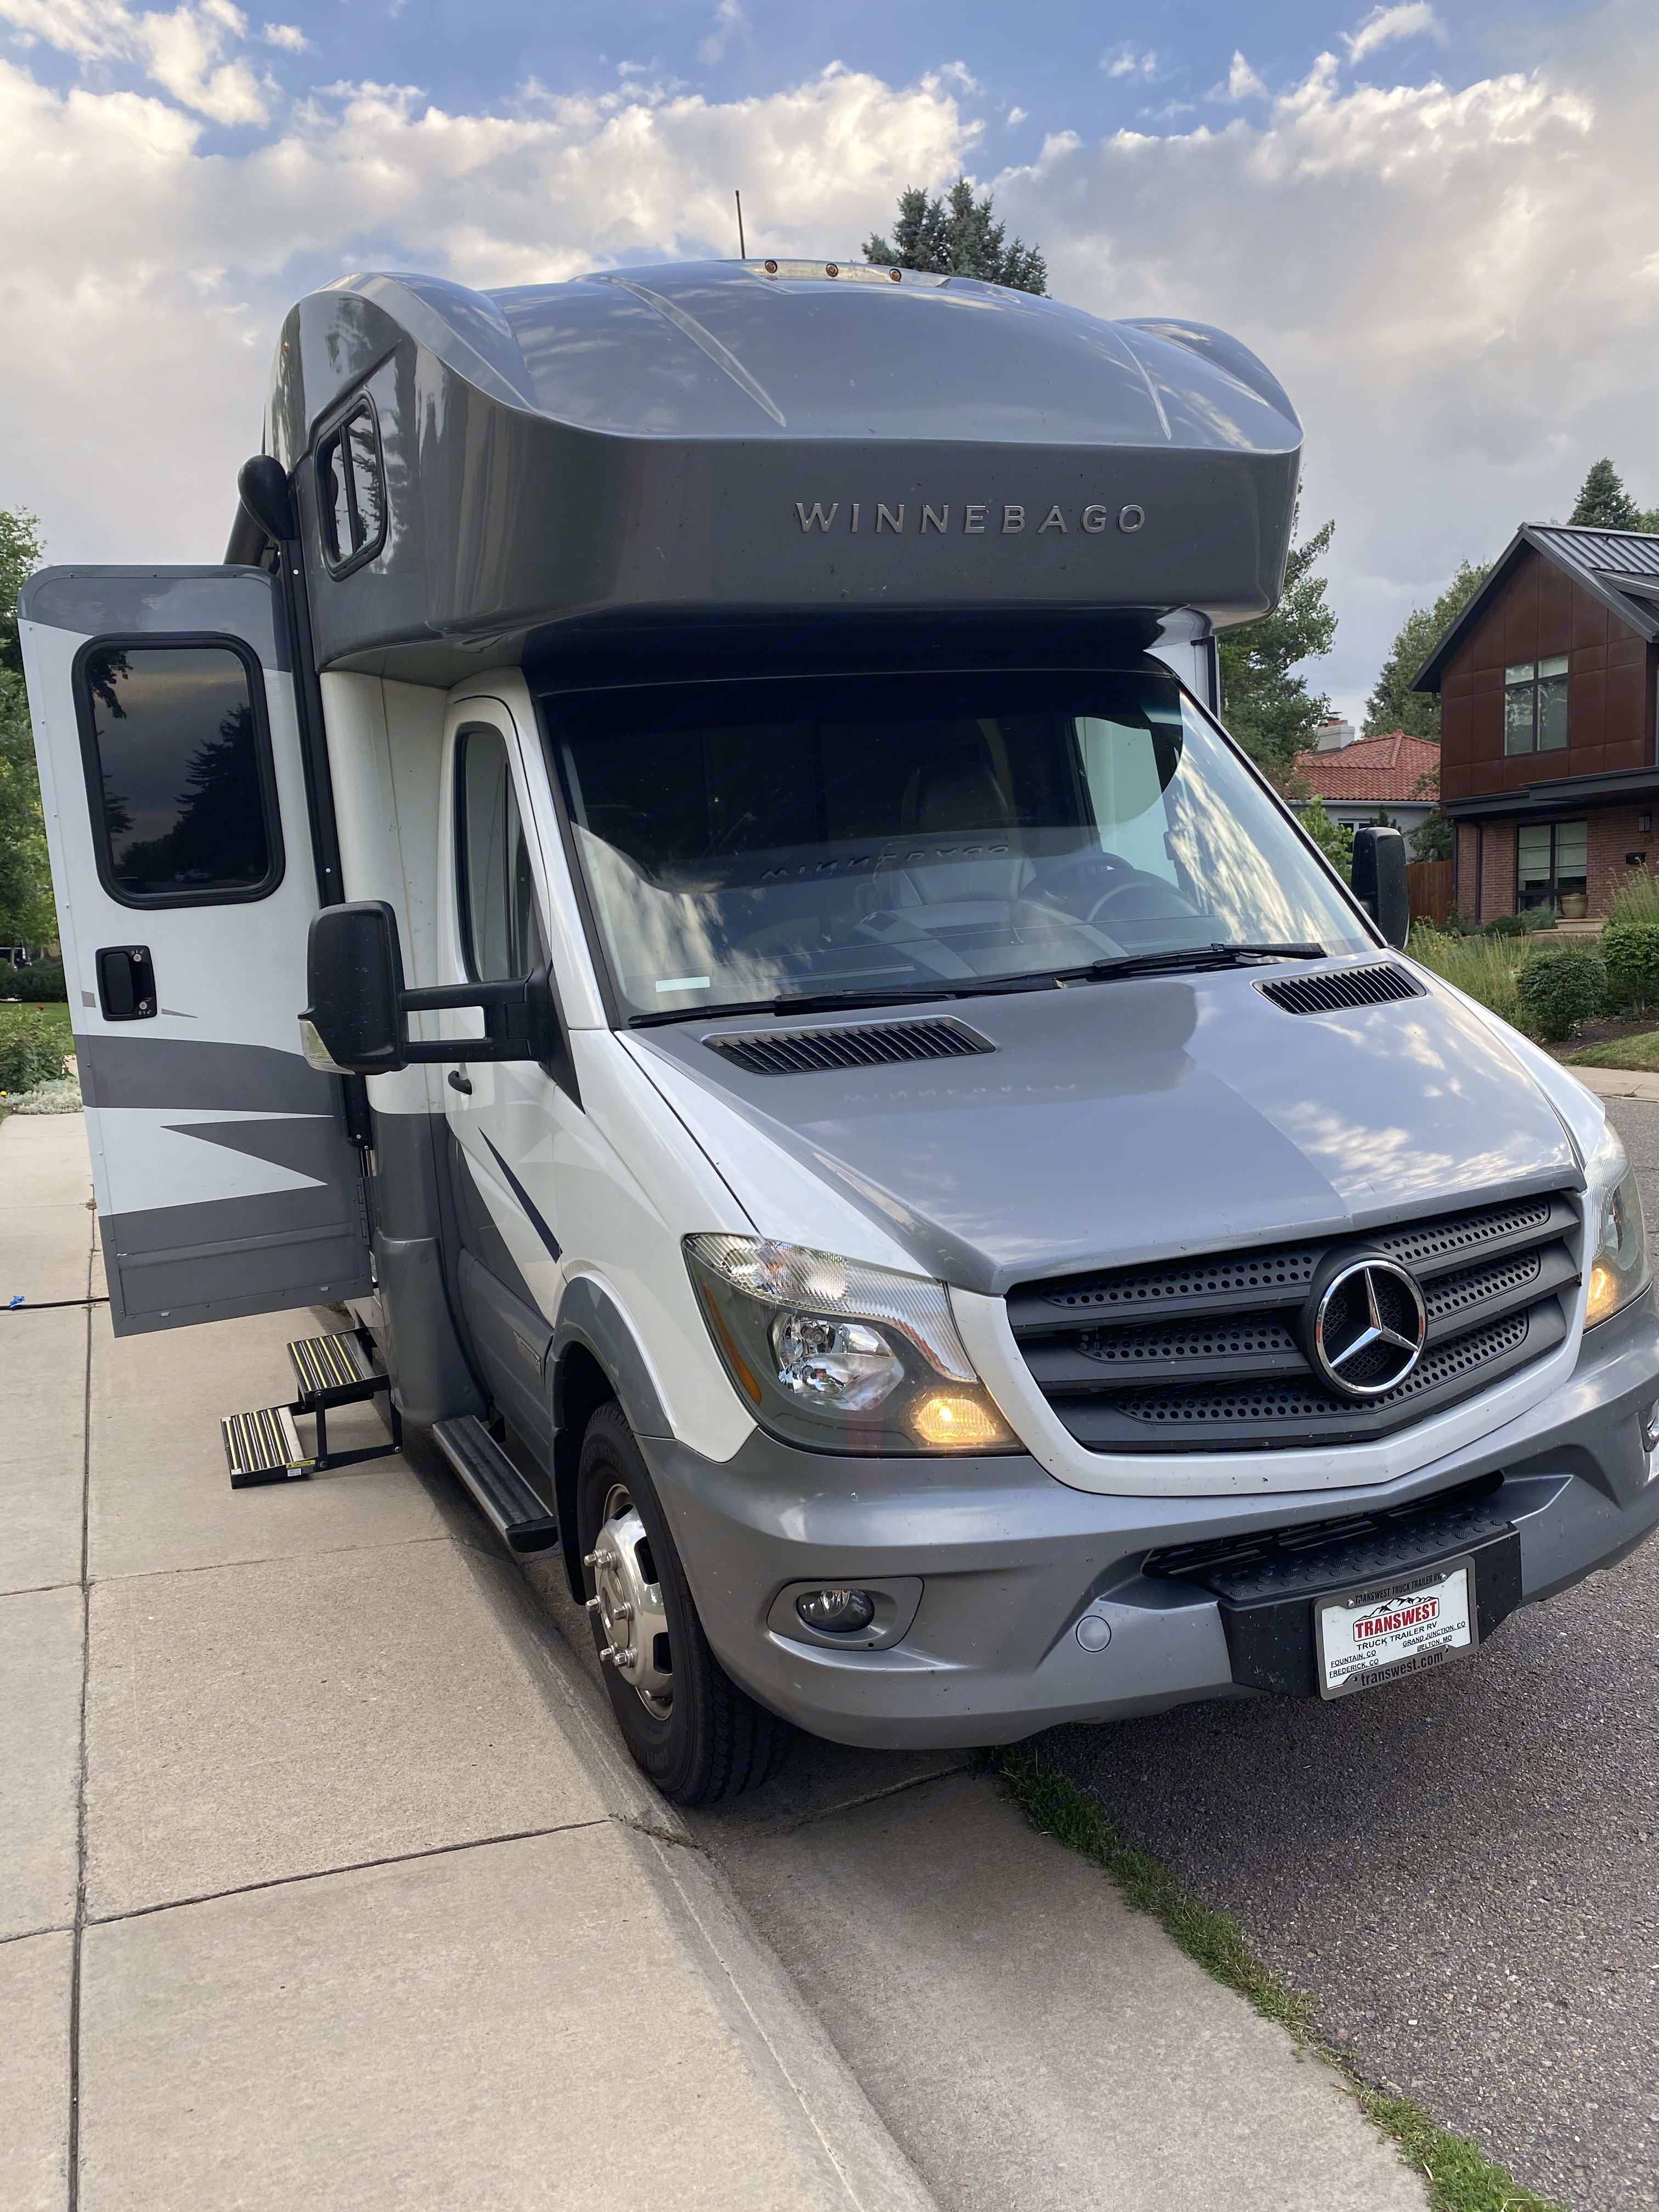 Front of vehicle. Mercedes Winnebago Navion 2019